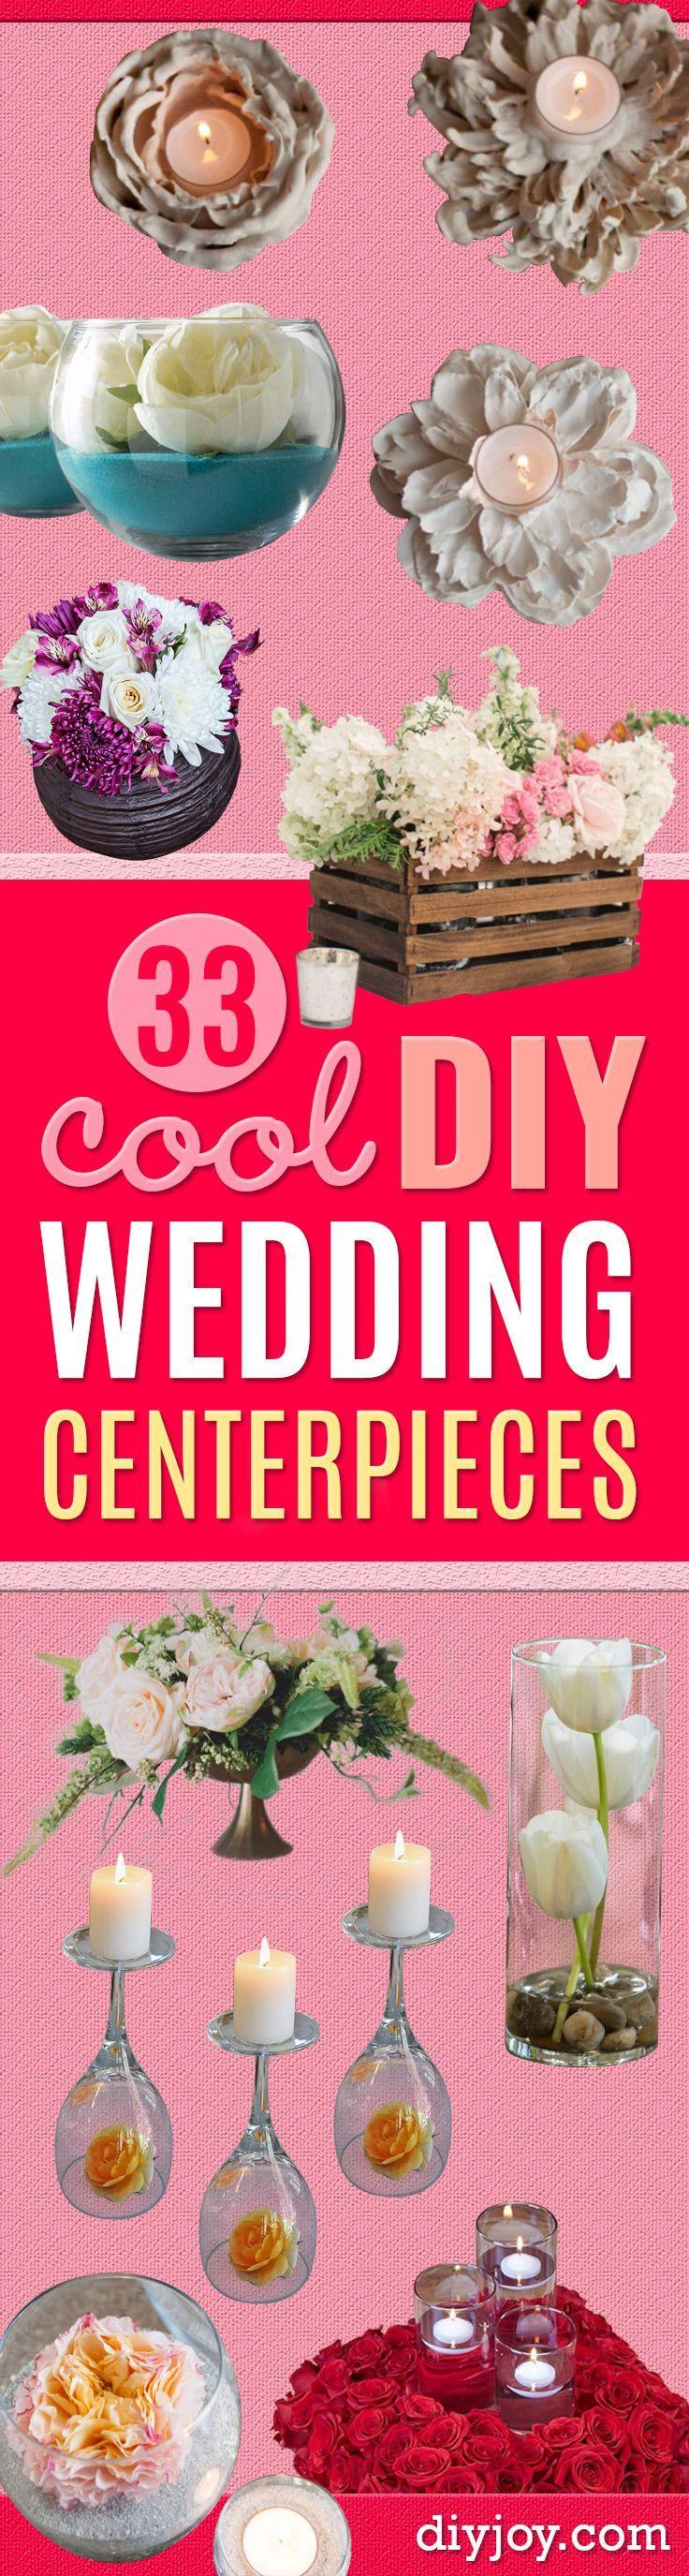 746 best Wedding DIY images on Pinterest | Wedding ideas, Wedding ...